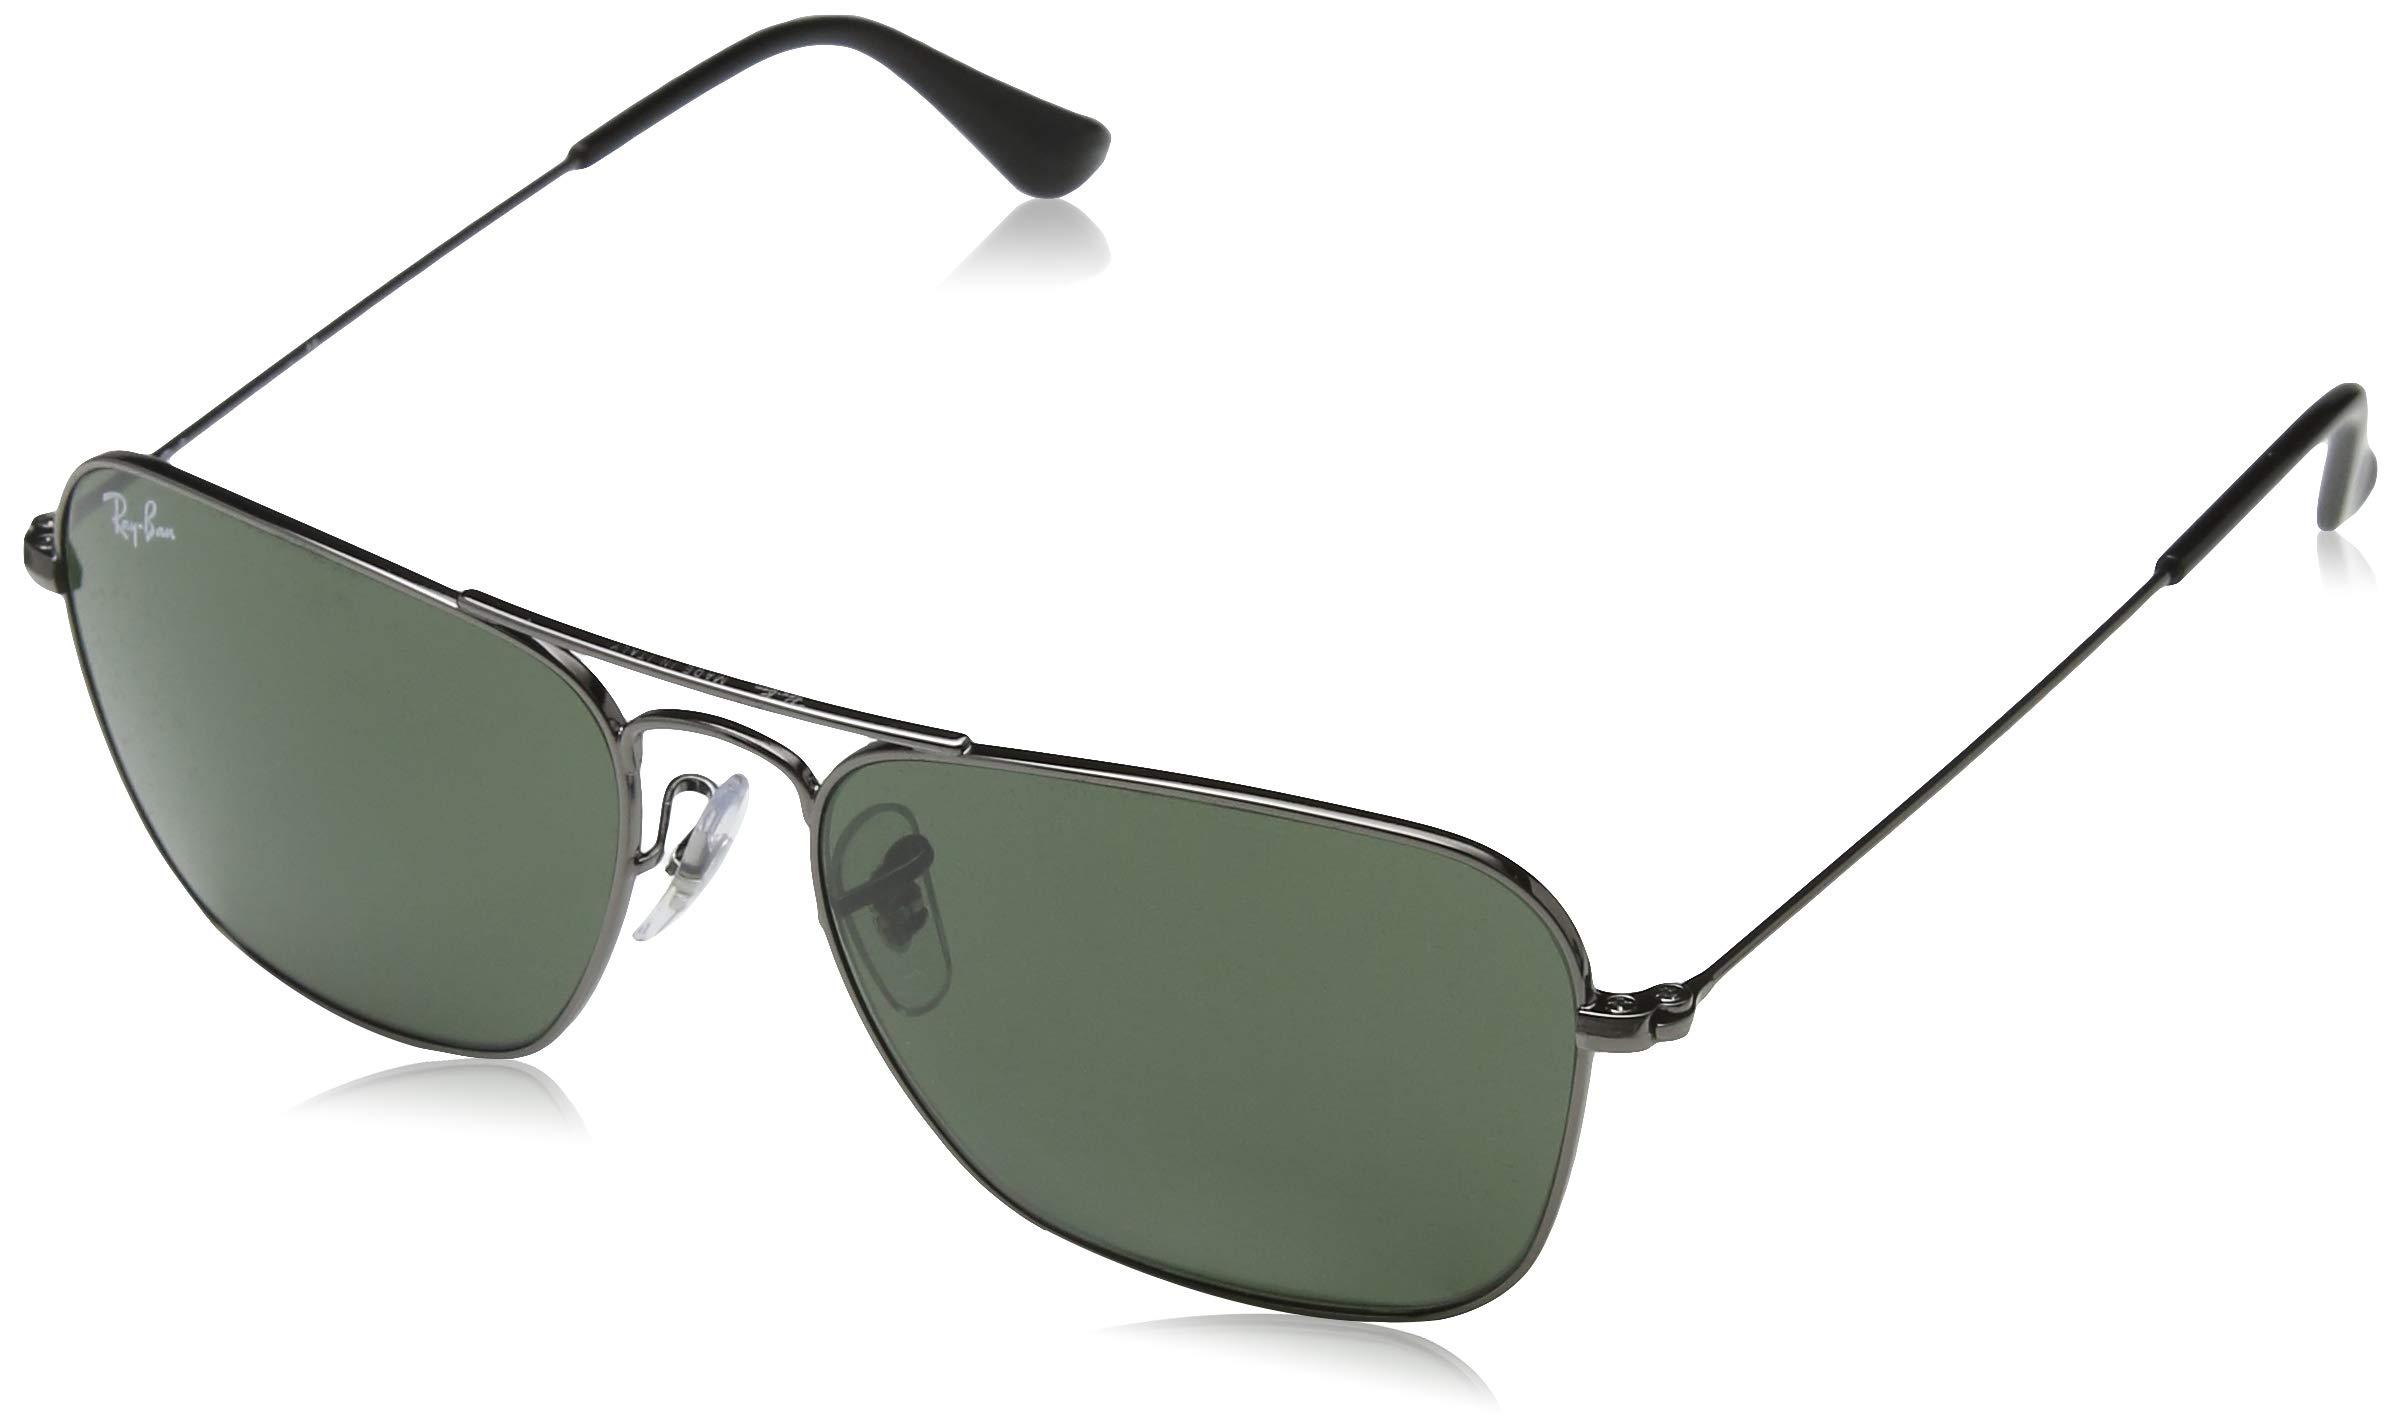 RAY-BAN RB3136 Caravan Square Sunglasses, Gunmetal/Green, 58 mm by RAY-BAN